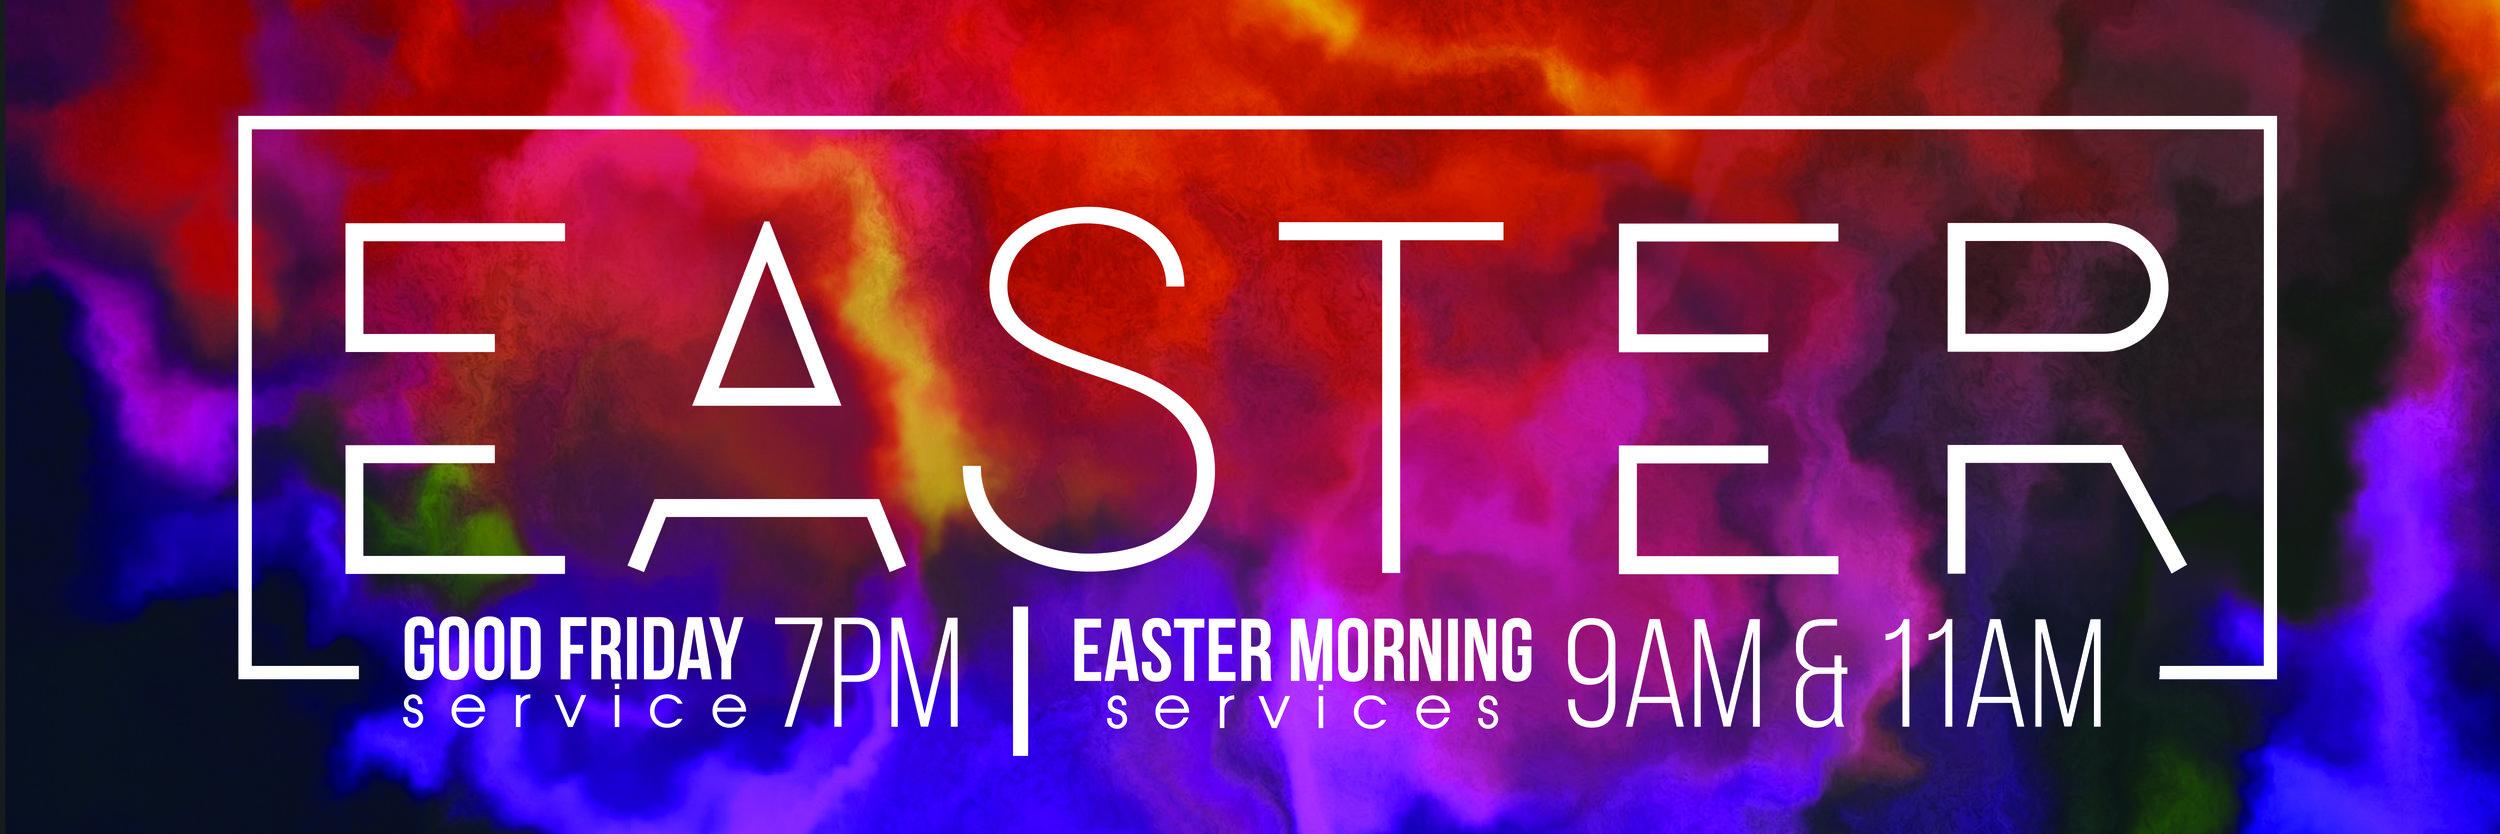 Easter2019_Facebook_BANNER.jpg